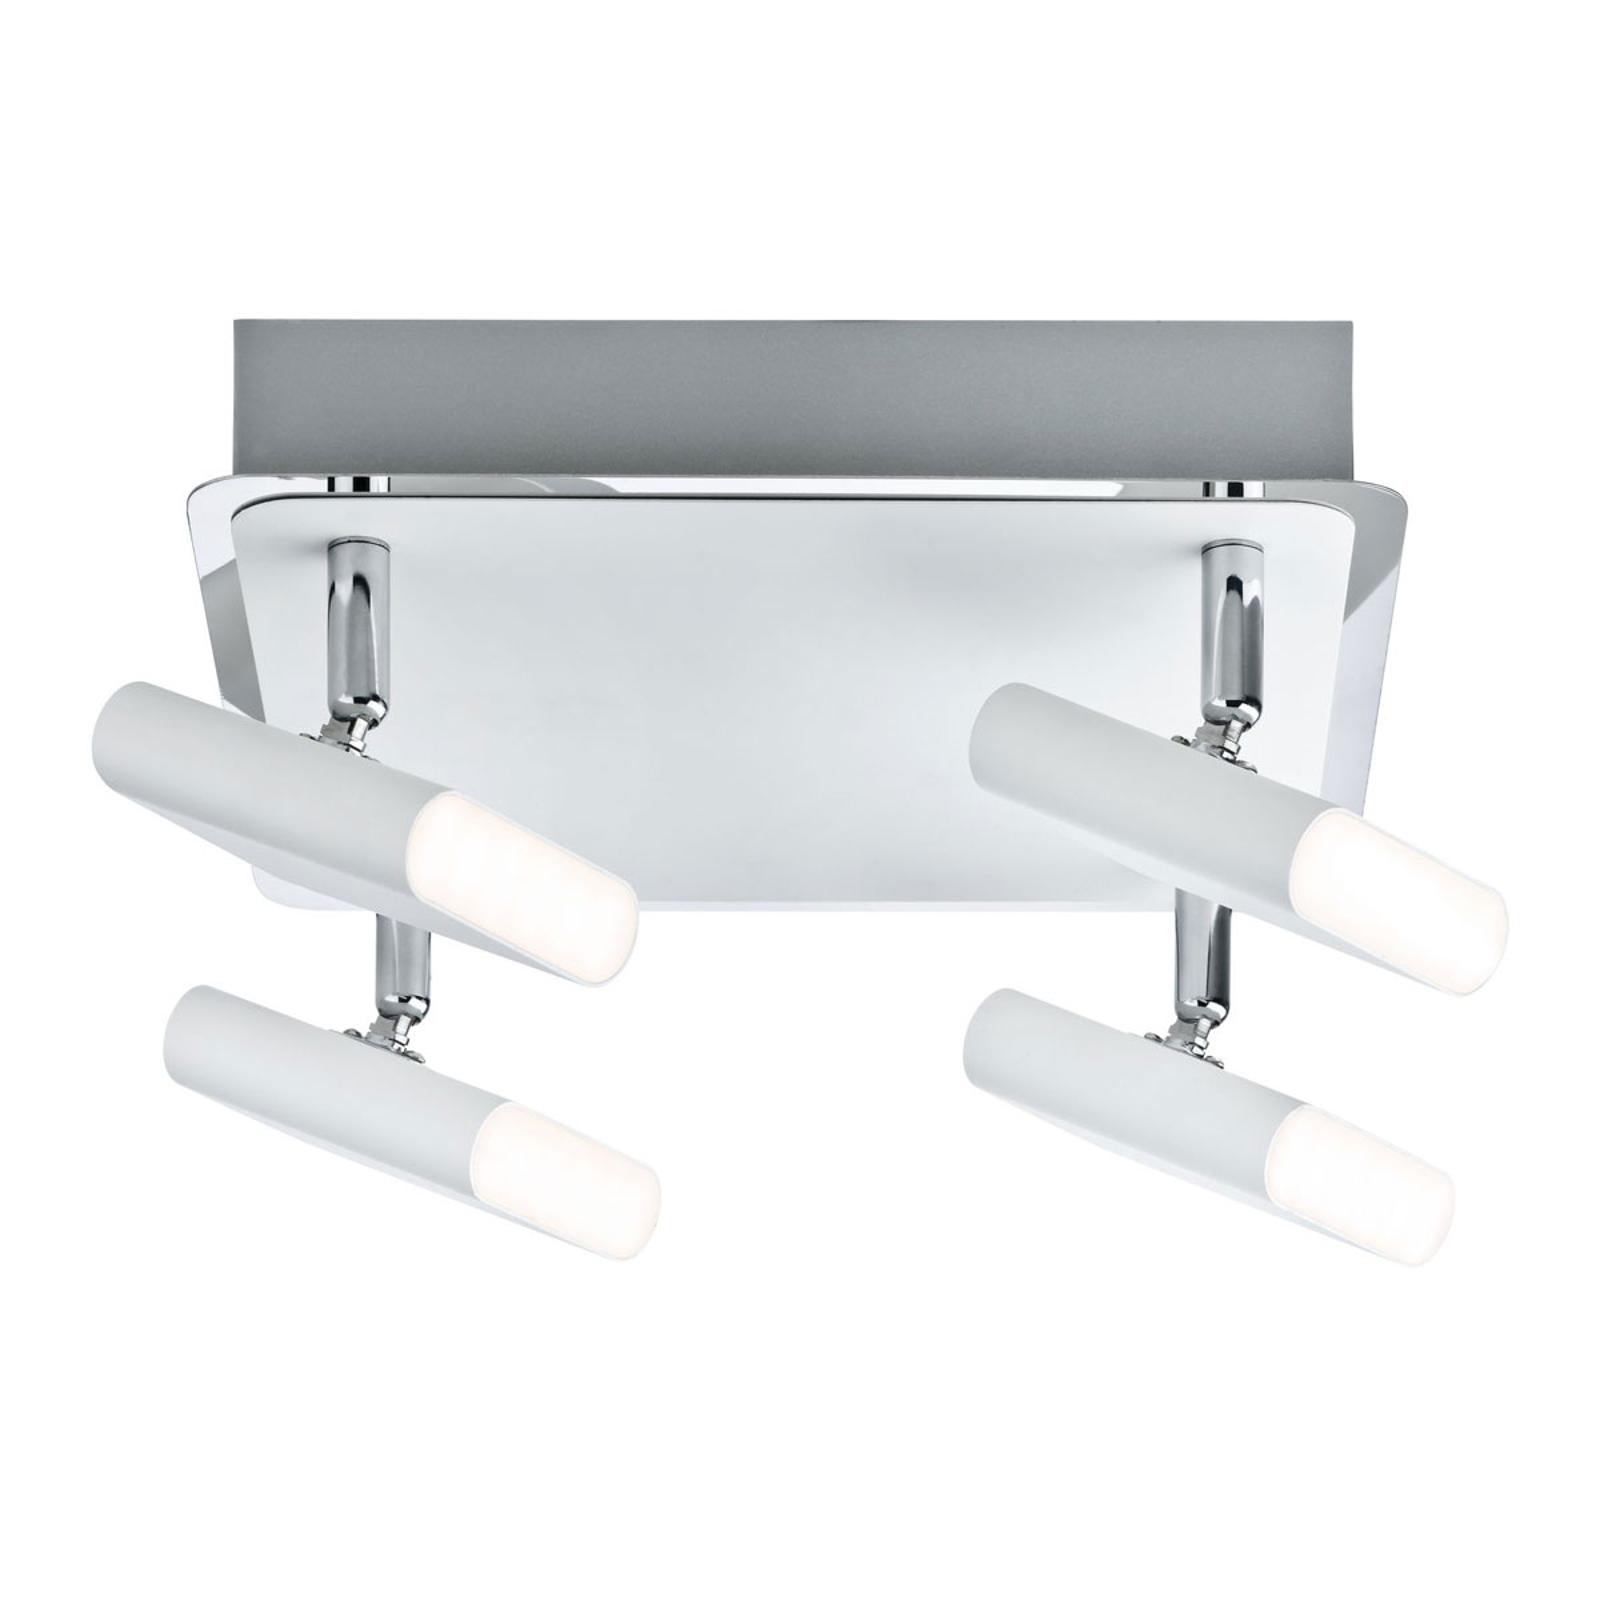 Paulmann Launcher LED plafondlamp, 4-lamps